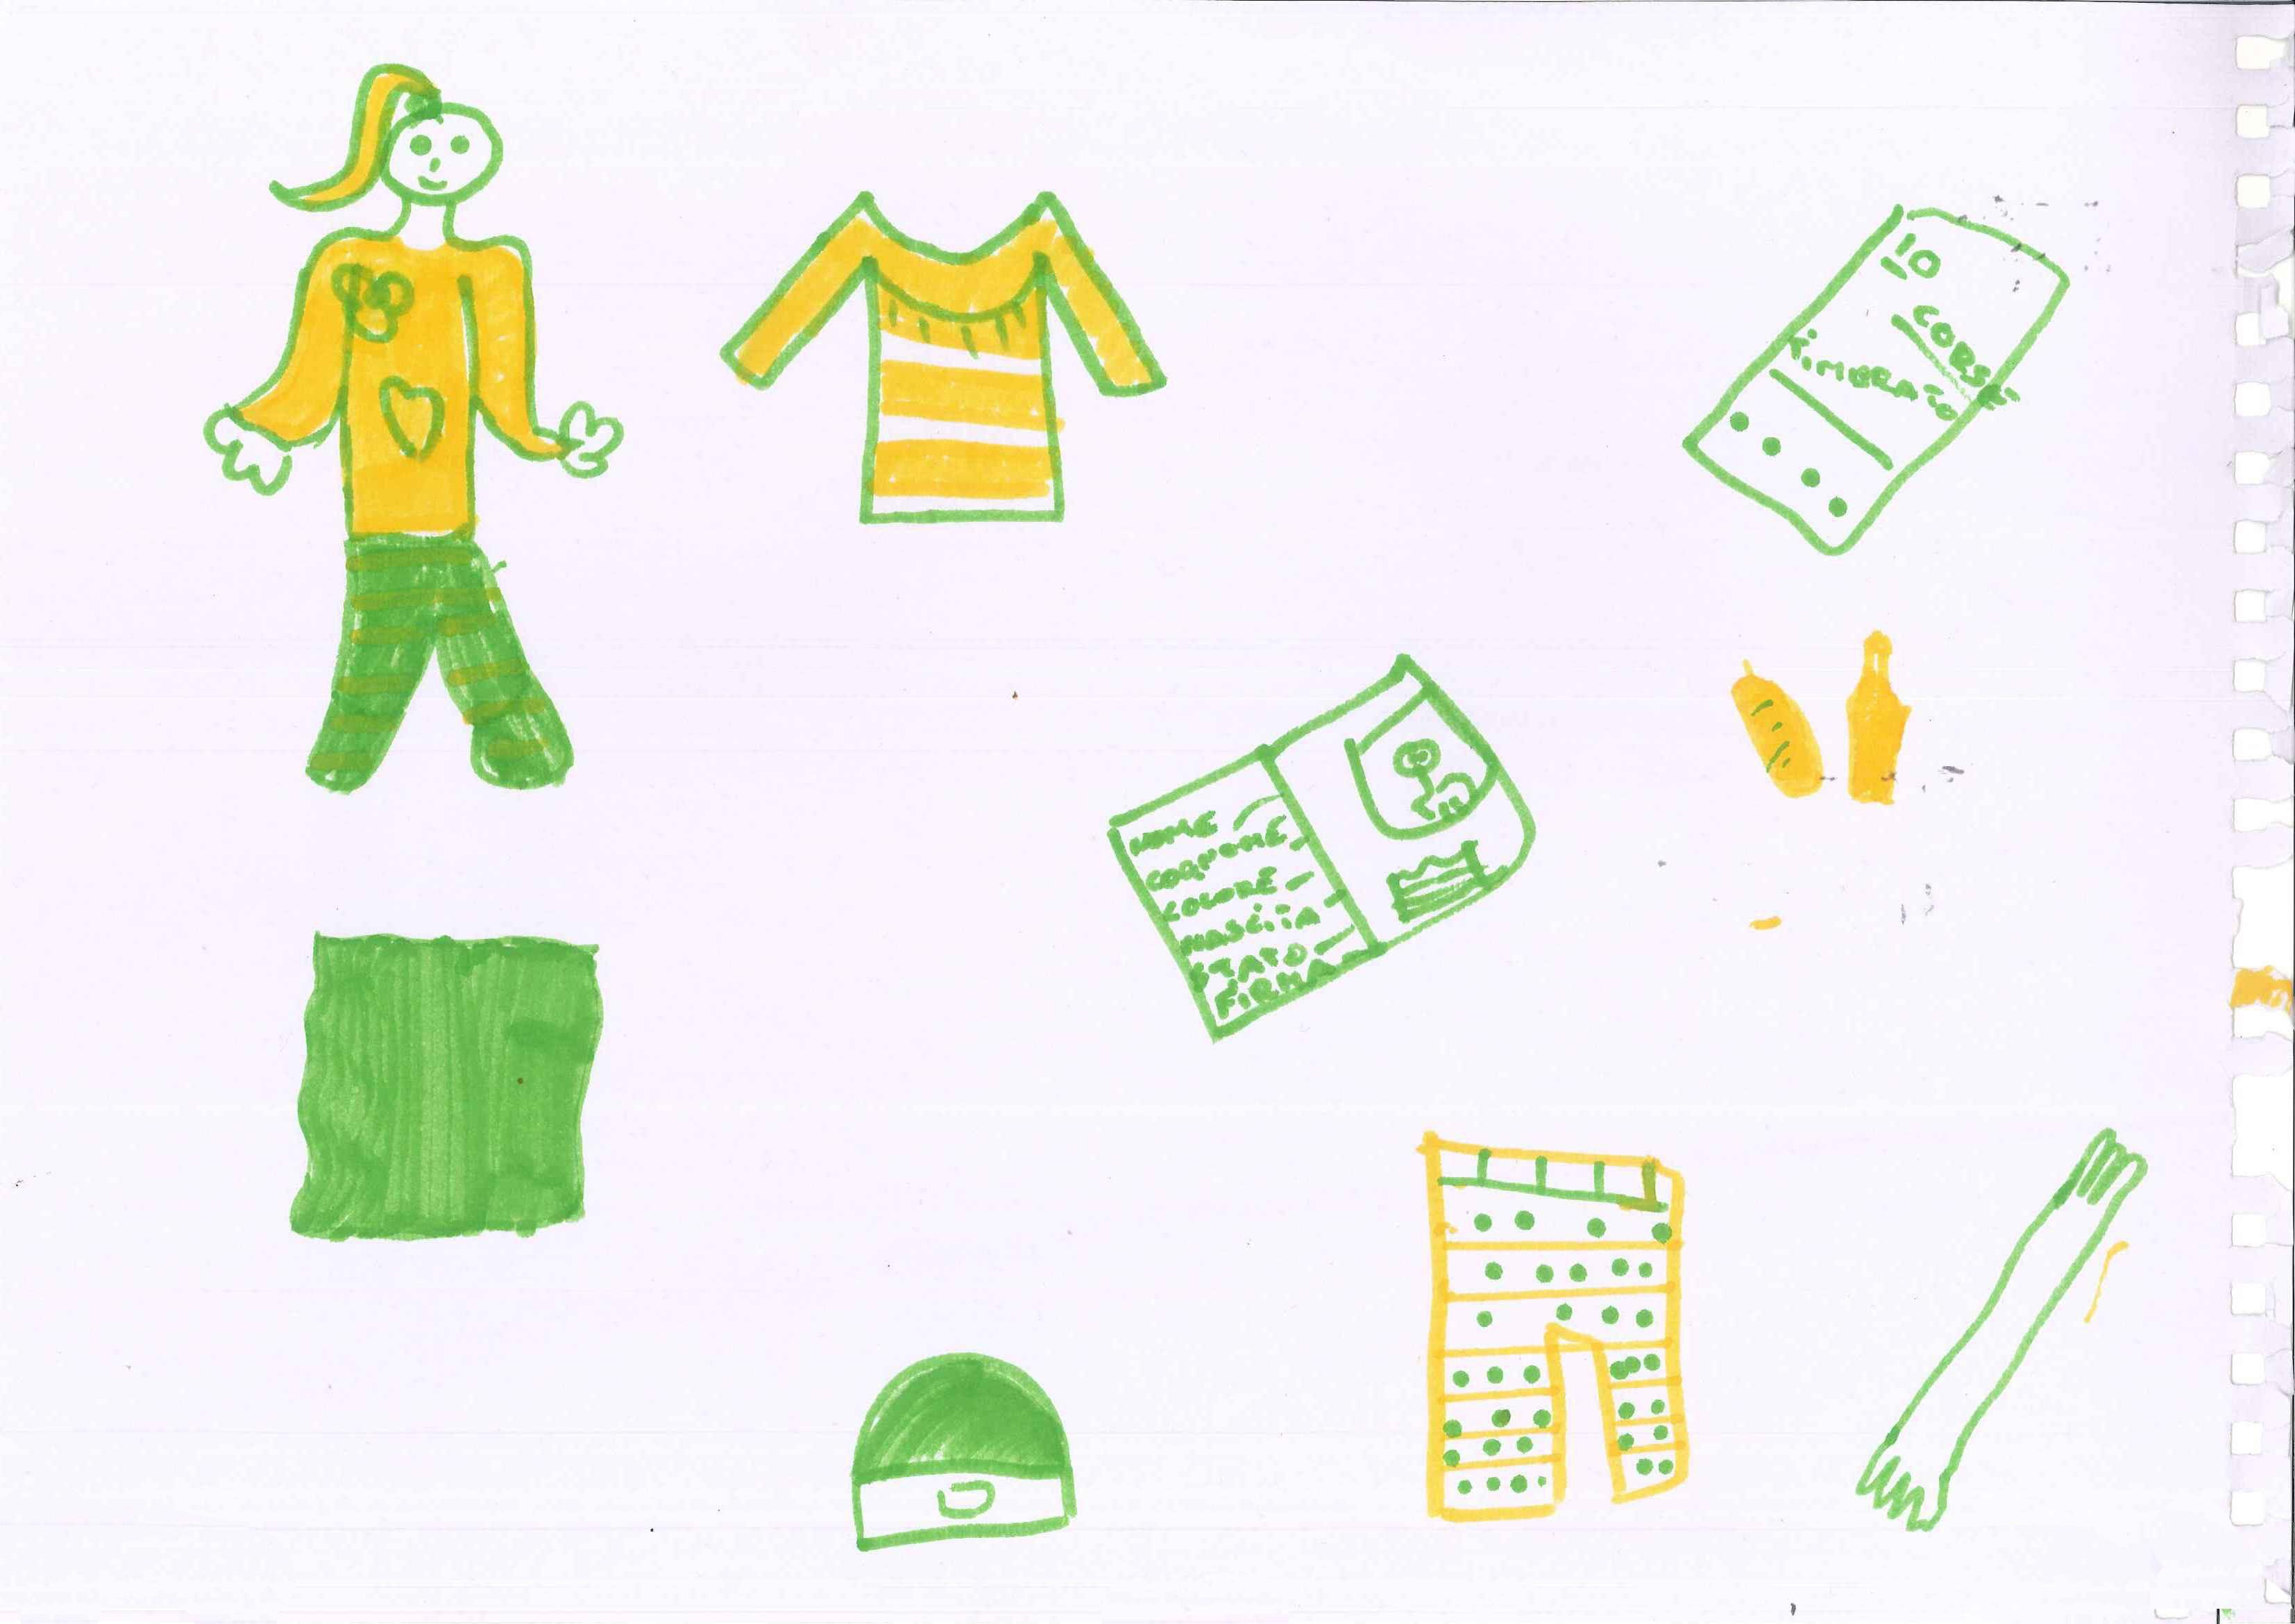 Disegni bimbi colori_Pagina_08